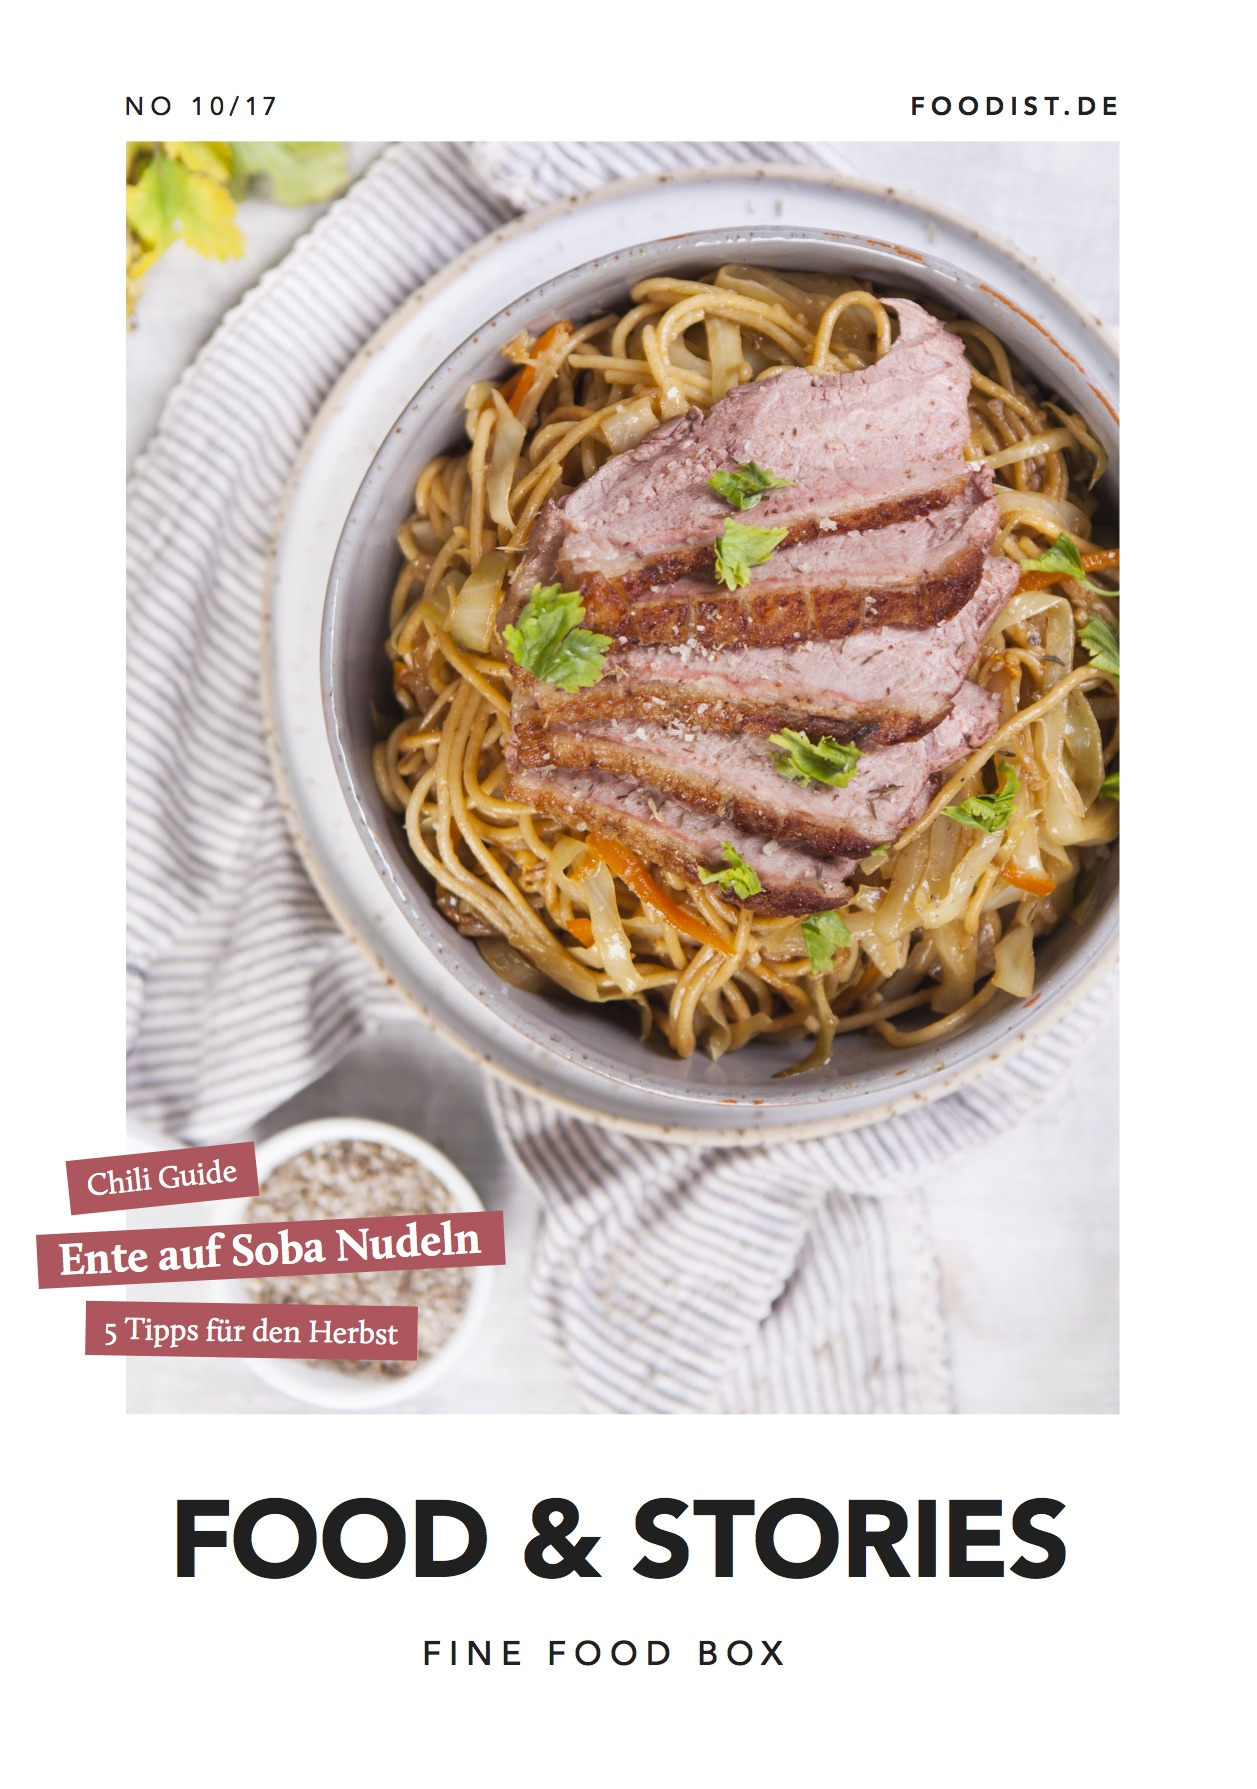 NUSSYY® im FOODIST MAGAZIN - COVER